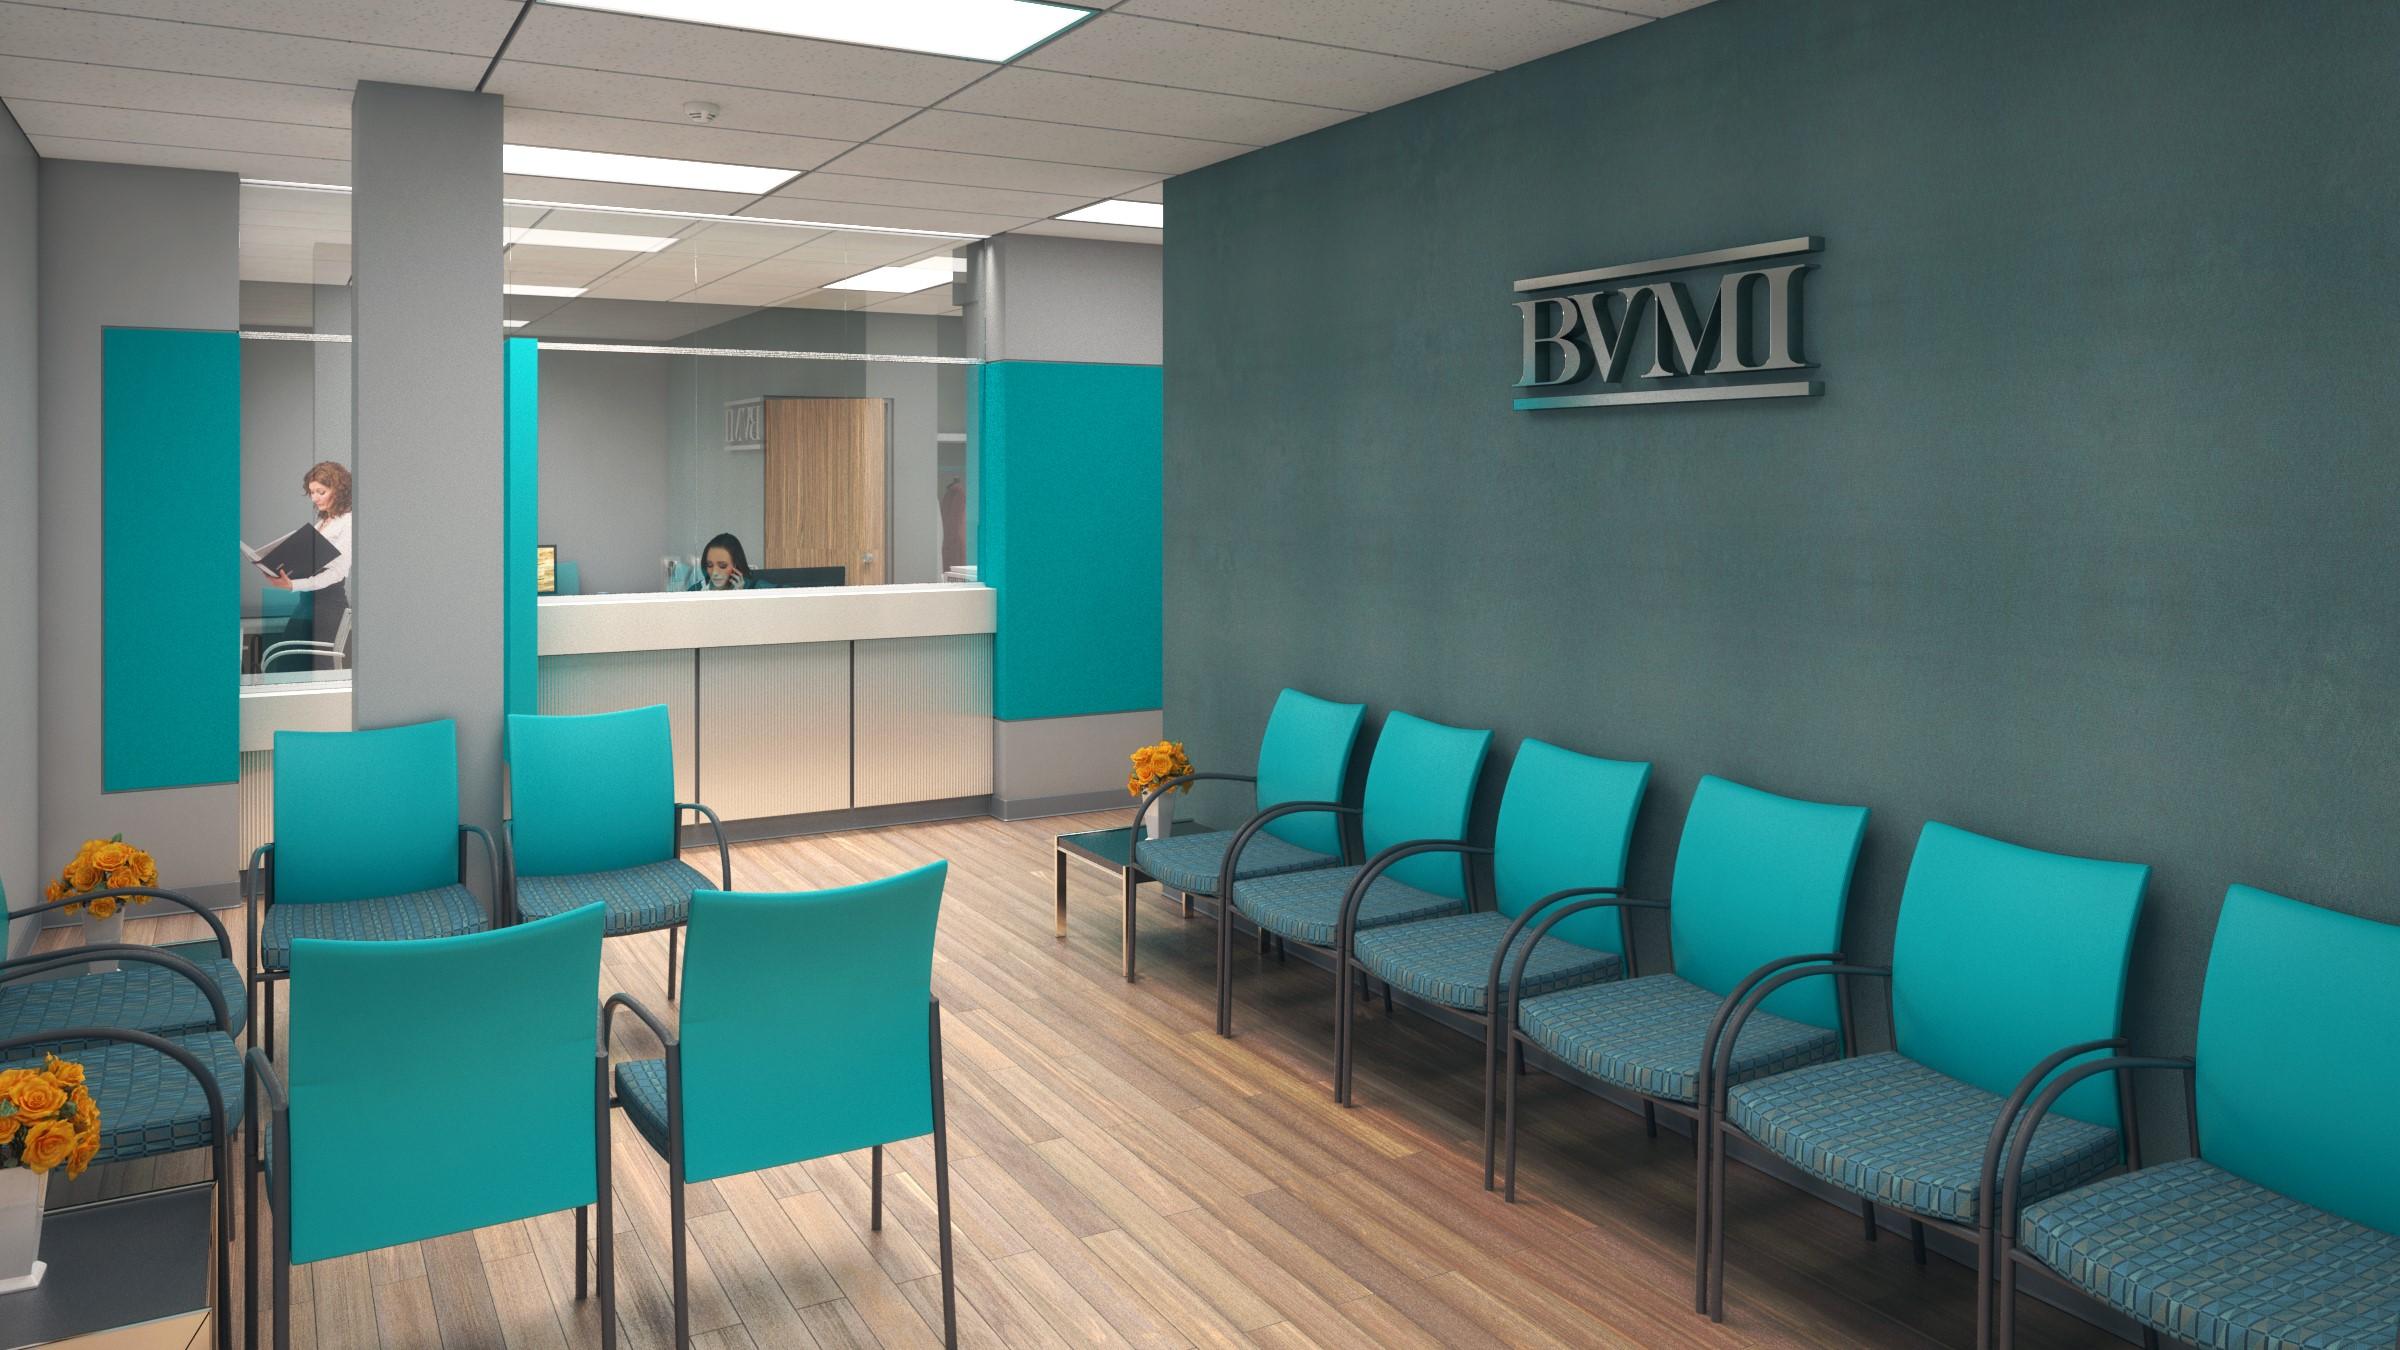 BVMI Reception Area.jpg